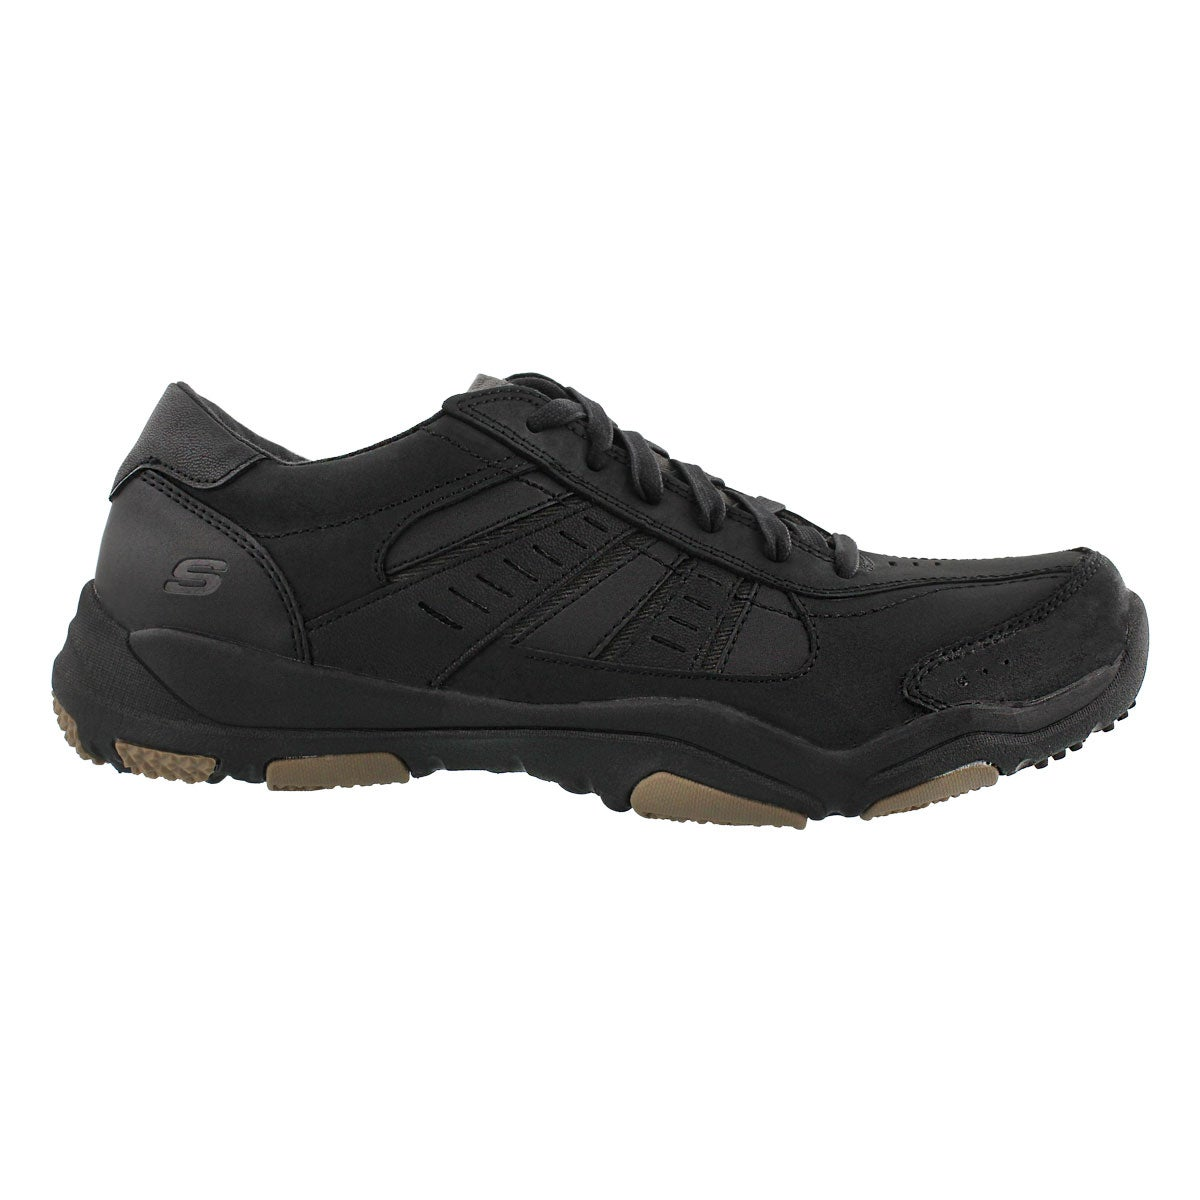 Mns Larson Nerick black bike toe sneaker